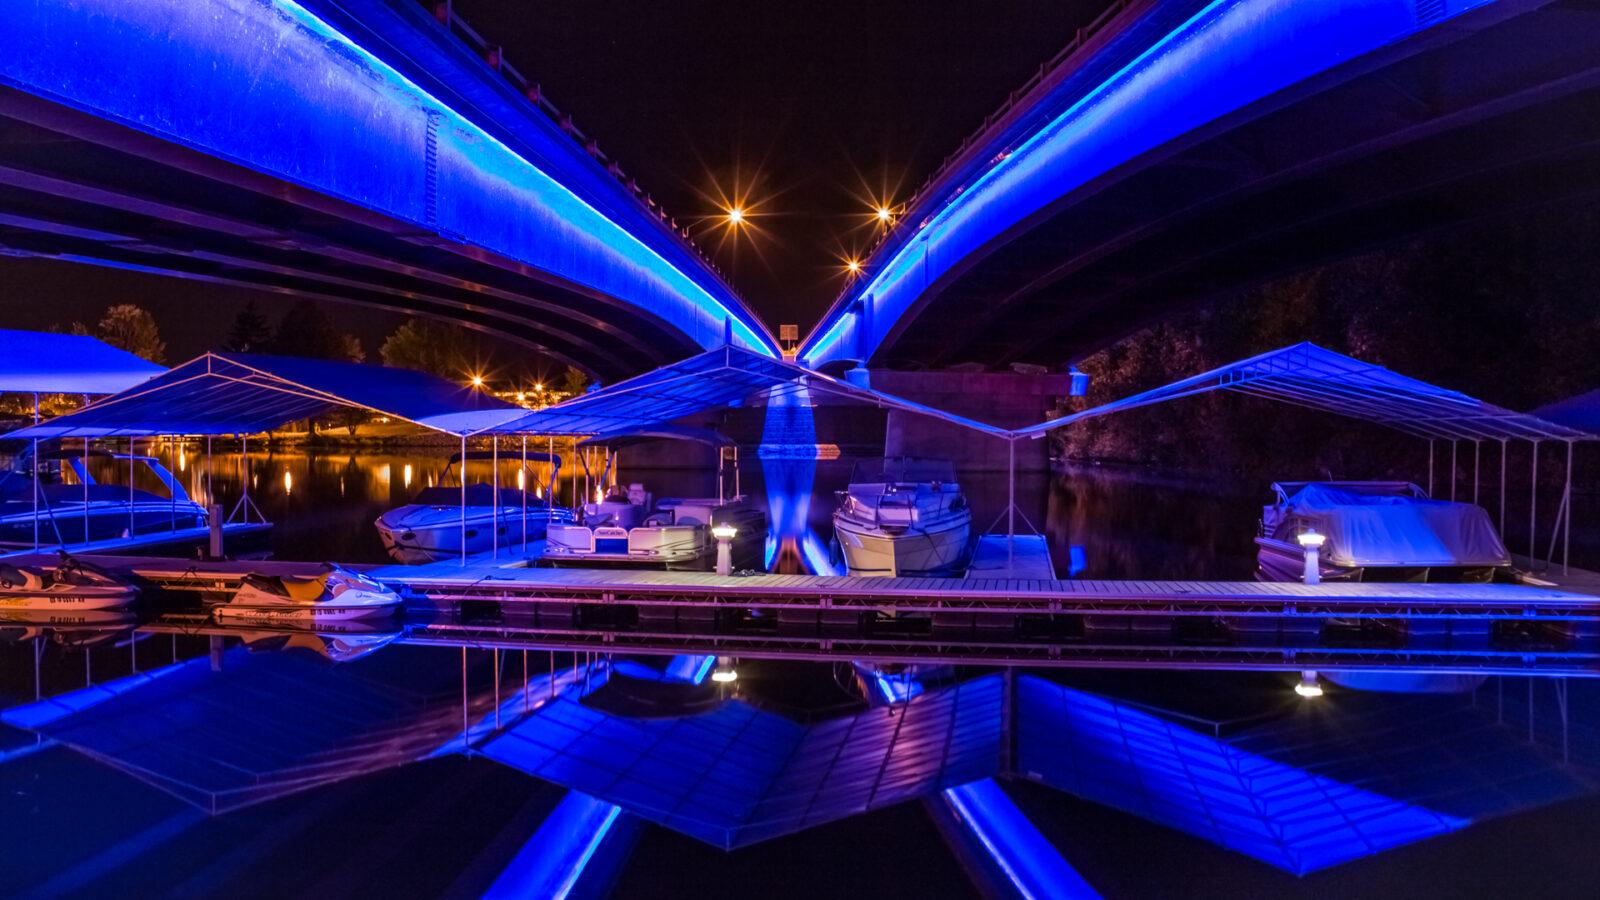 Lights Under The Bridge 2015